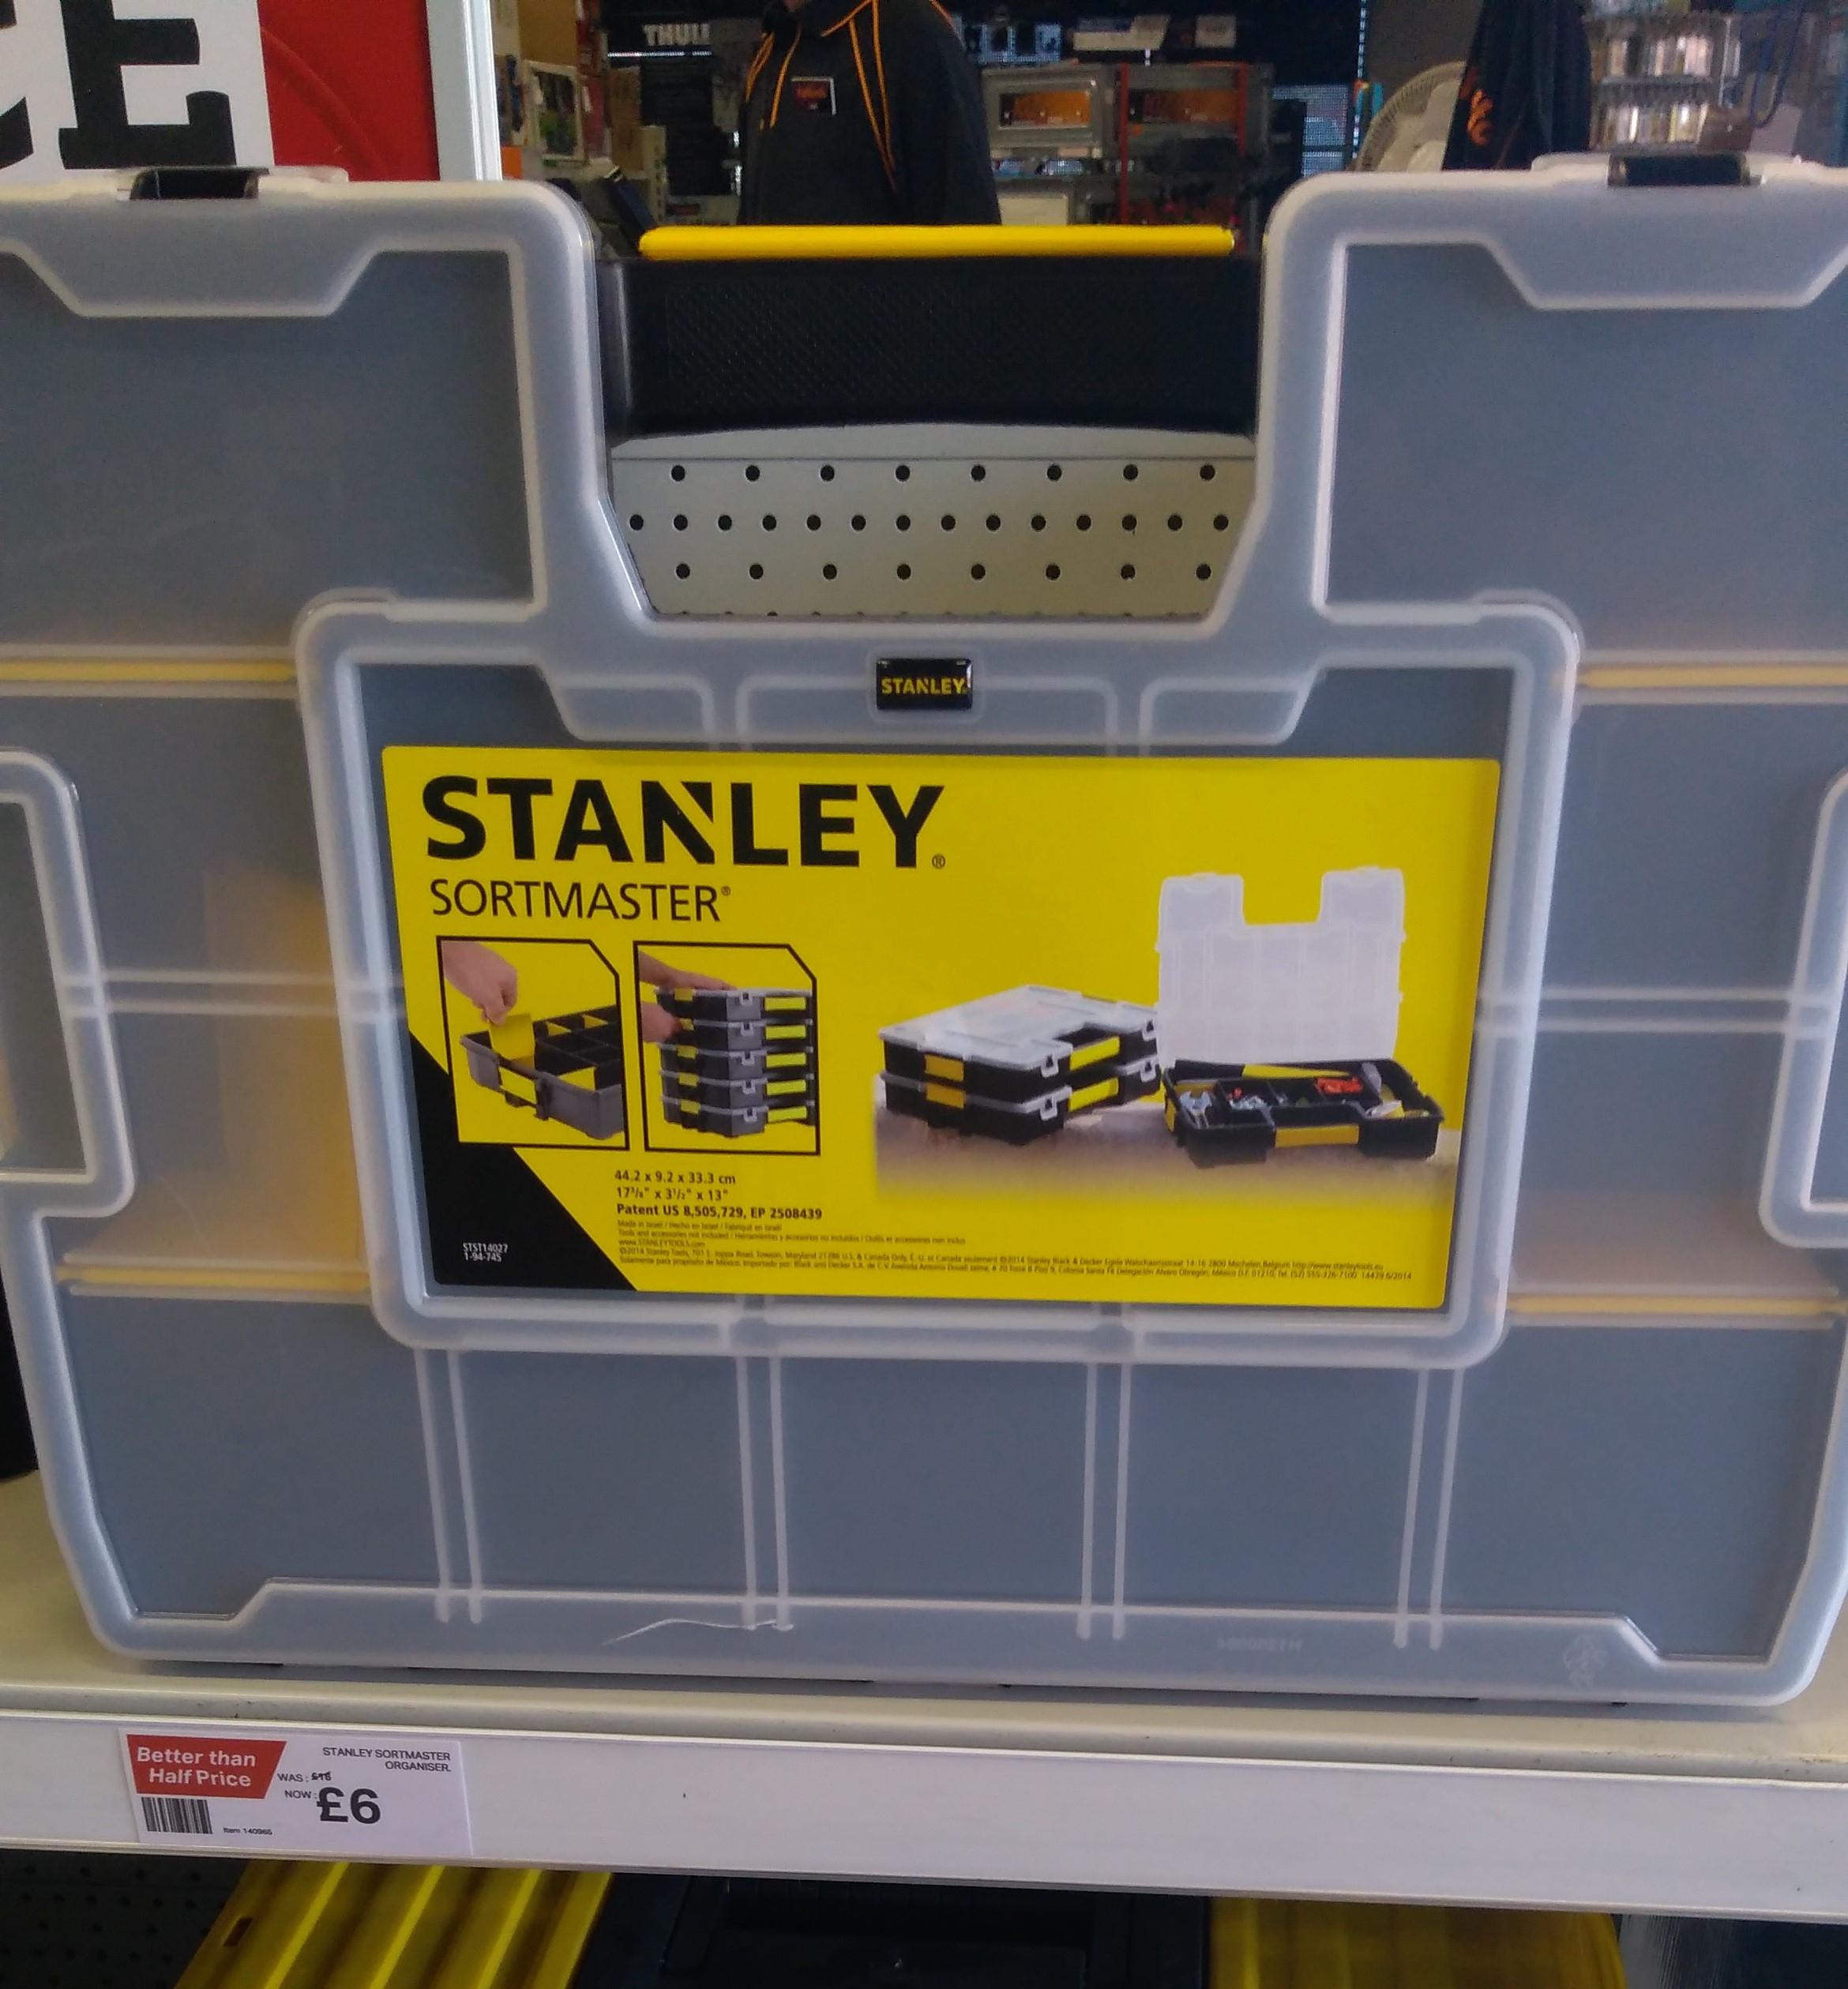 STANLEY SORT MASTER ORGANISER @Halfords In Store/online RRP £16 now £6